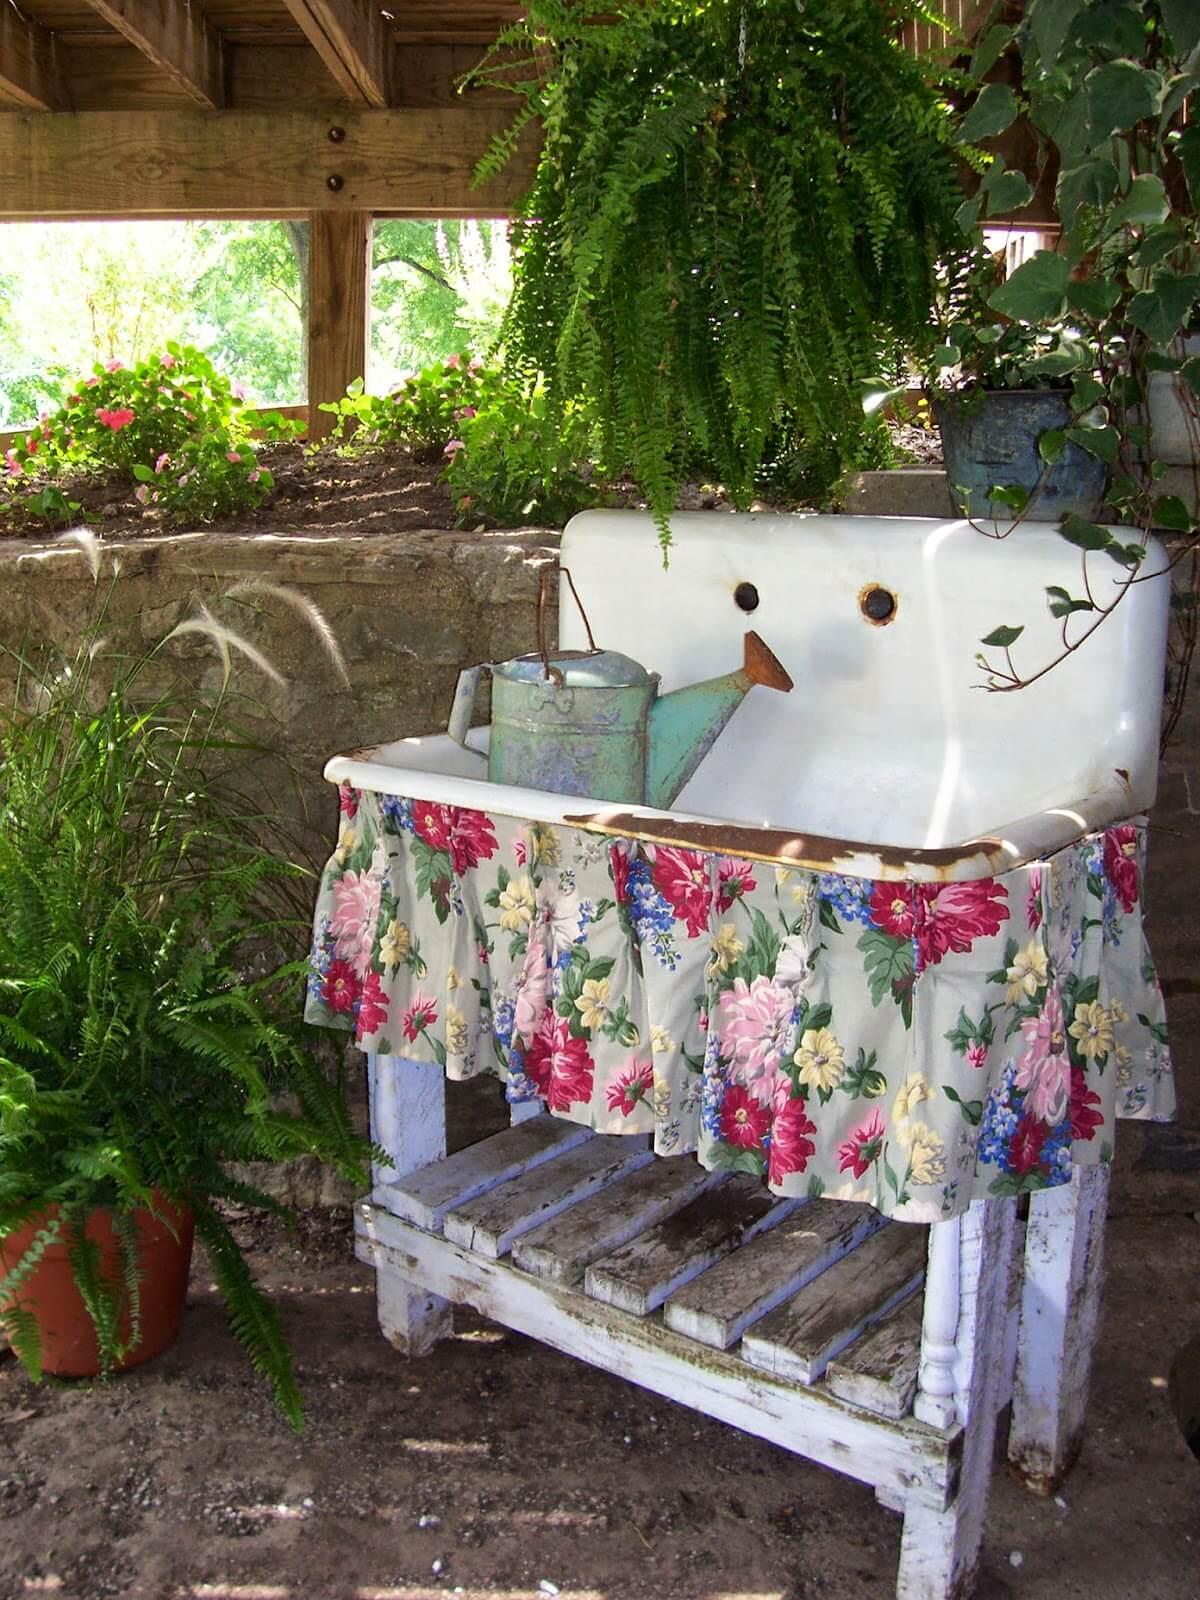 34 Best Vintage Garden Decor Ideas and Designs for 2020 on Garden Decor Ideas  id=19128